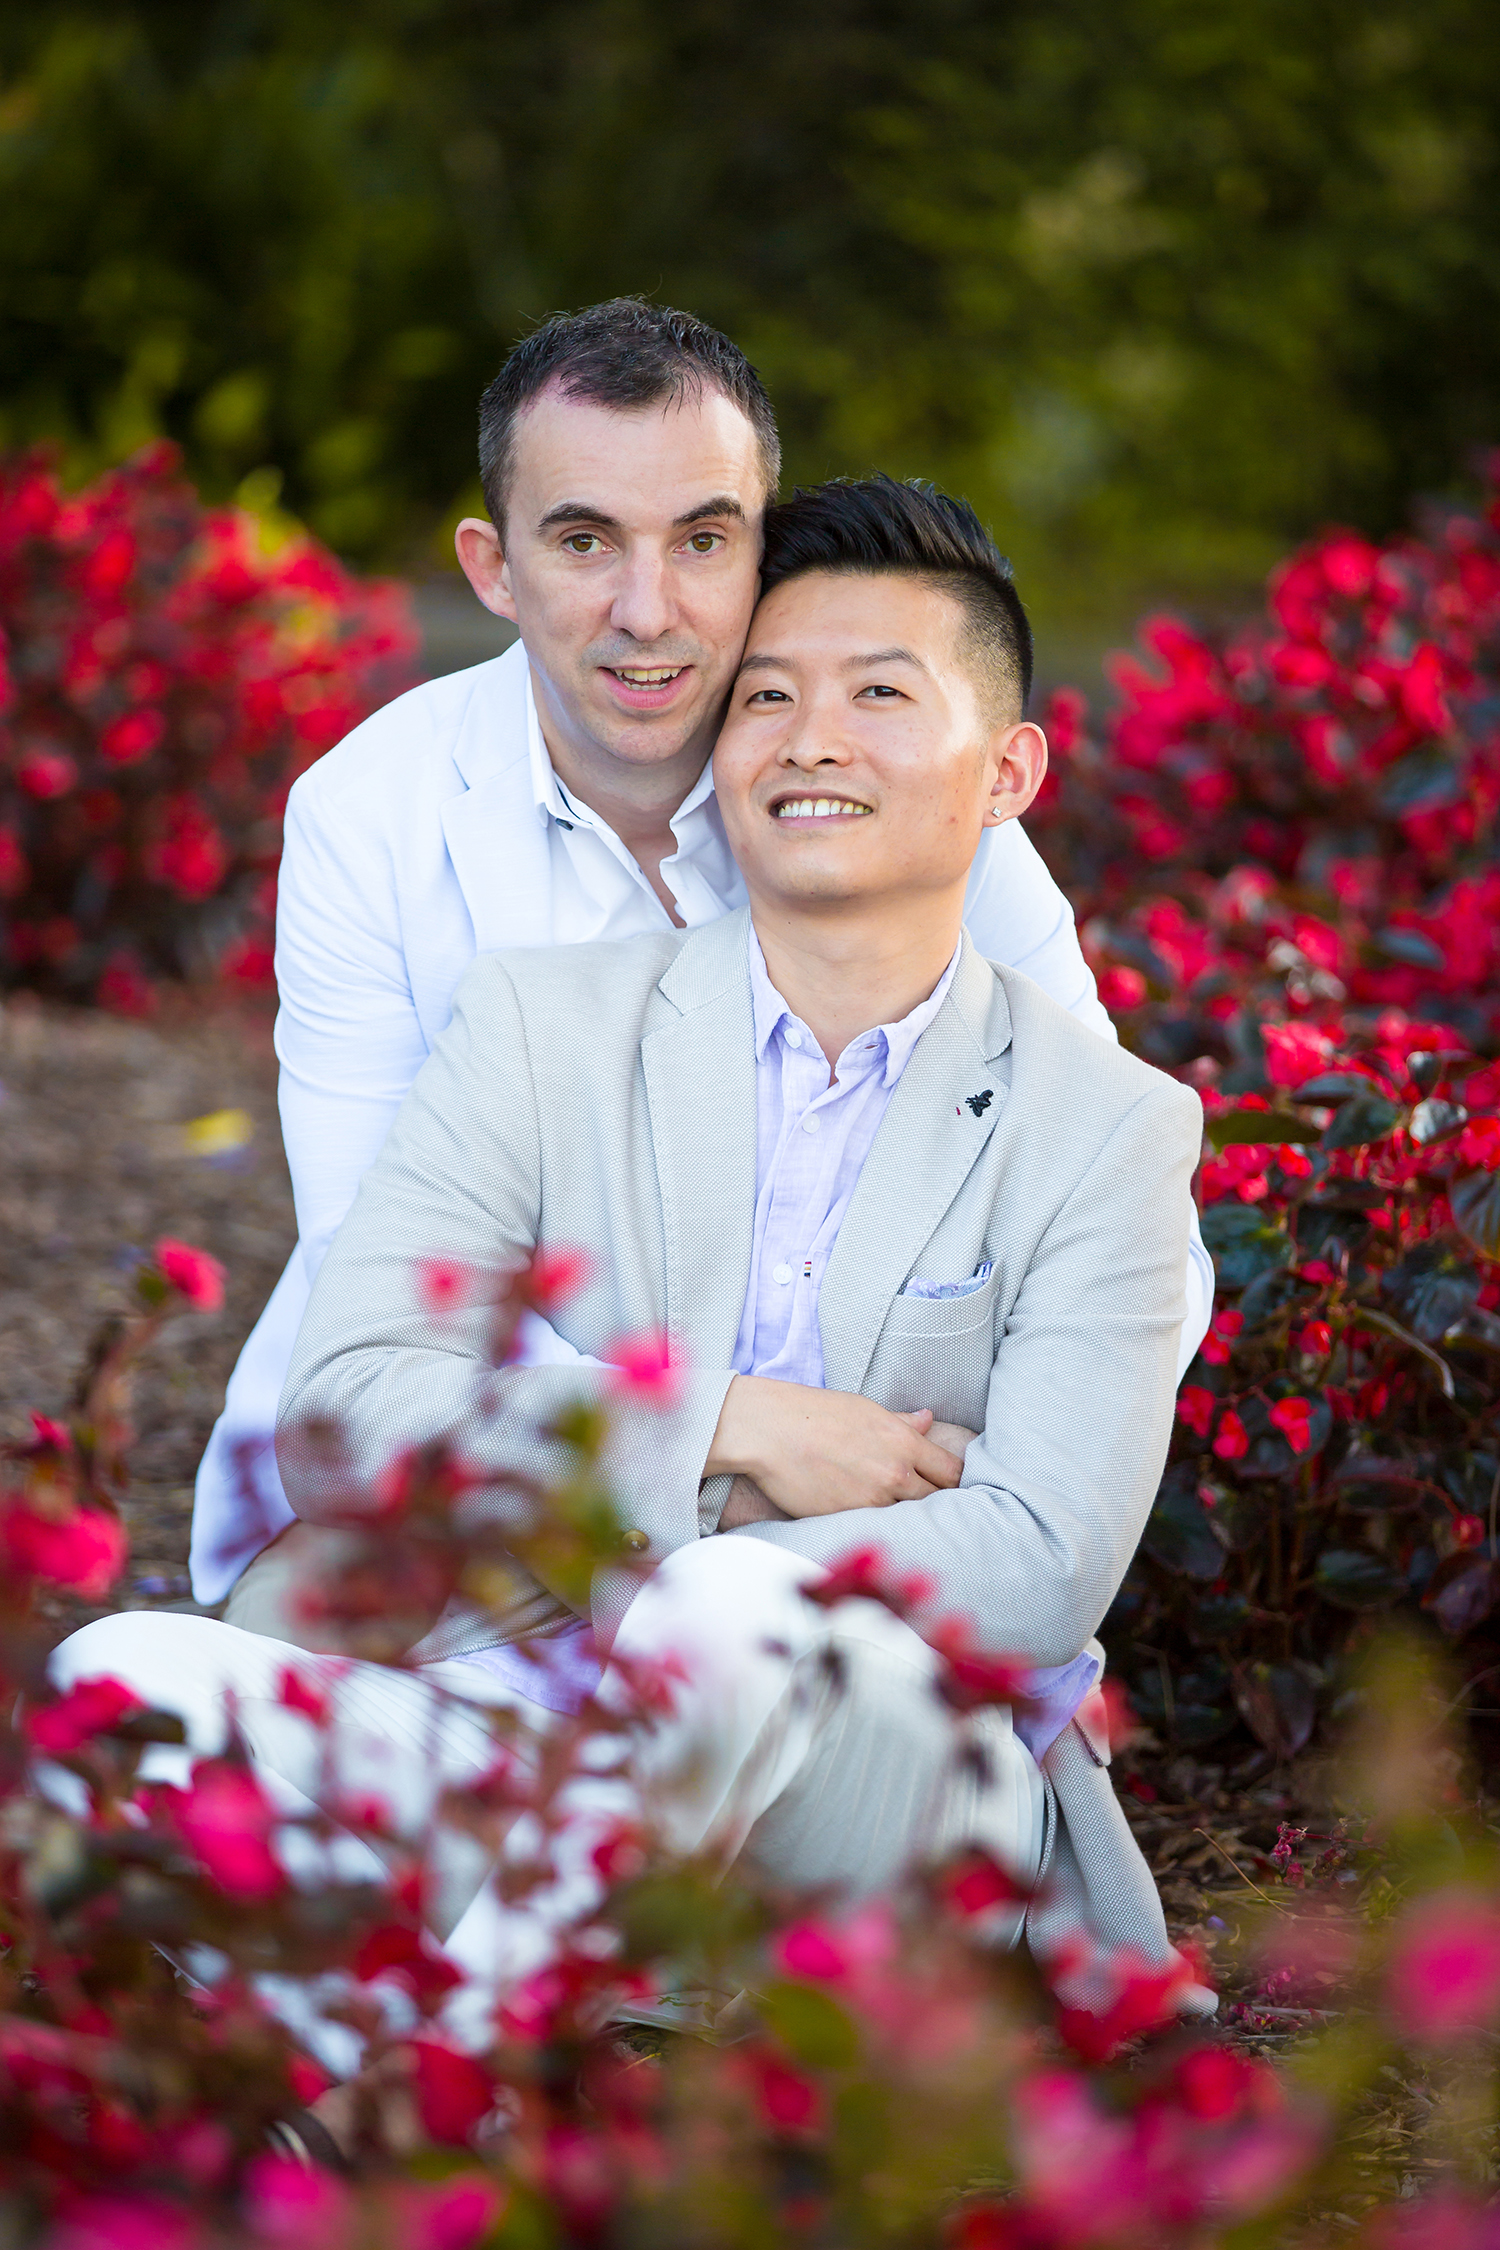 Sydney Gay Wedding Photographer - Jennifer Lam Photography (44).jpg